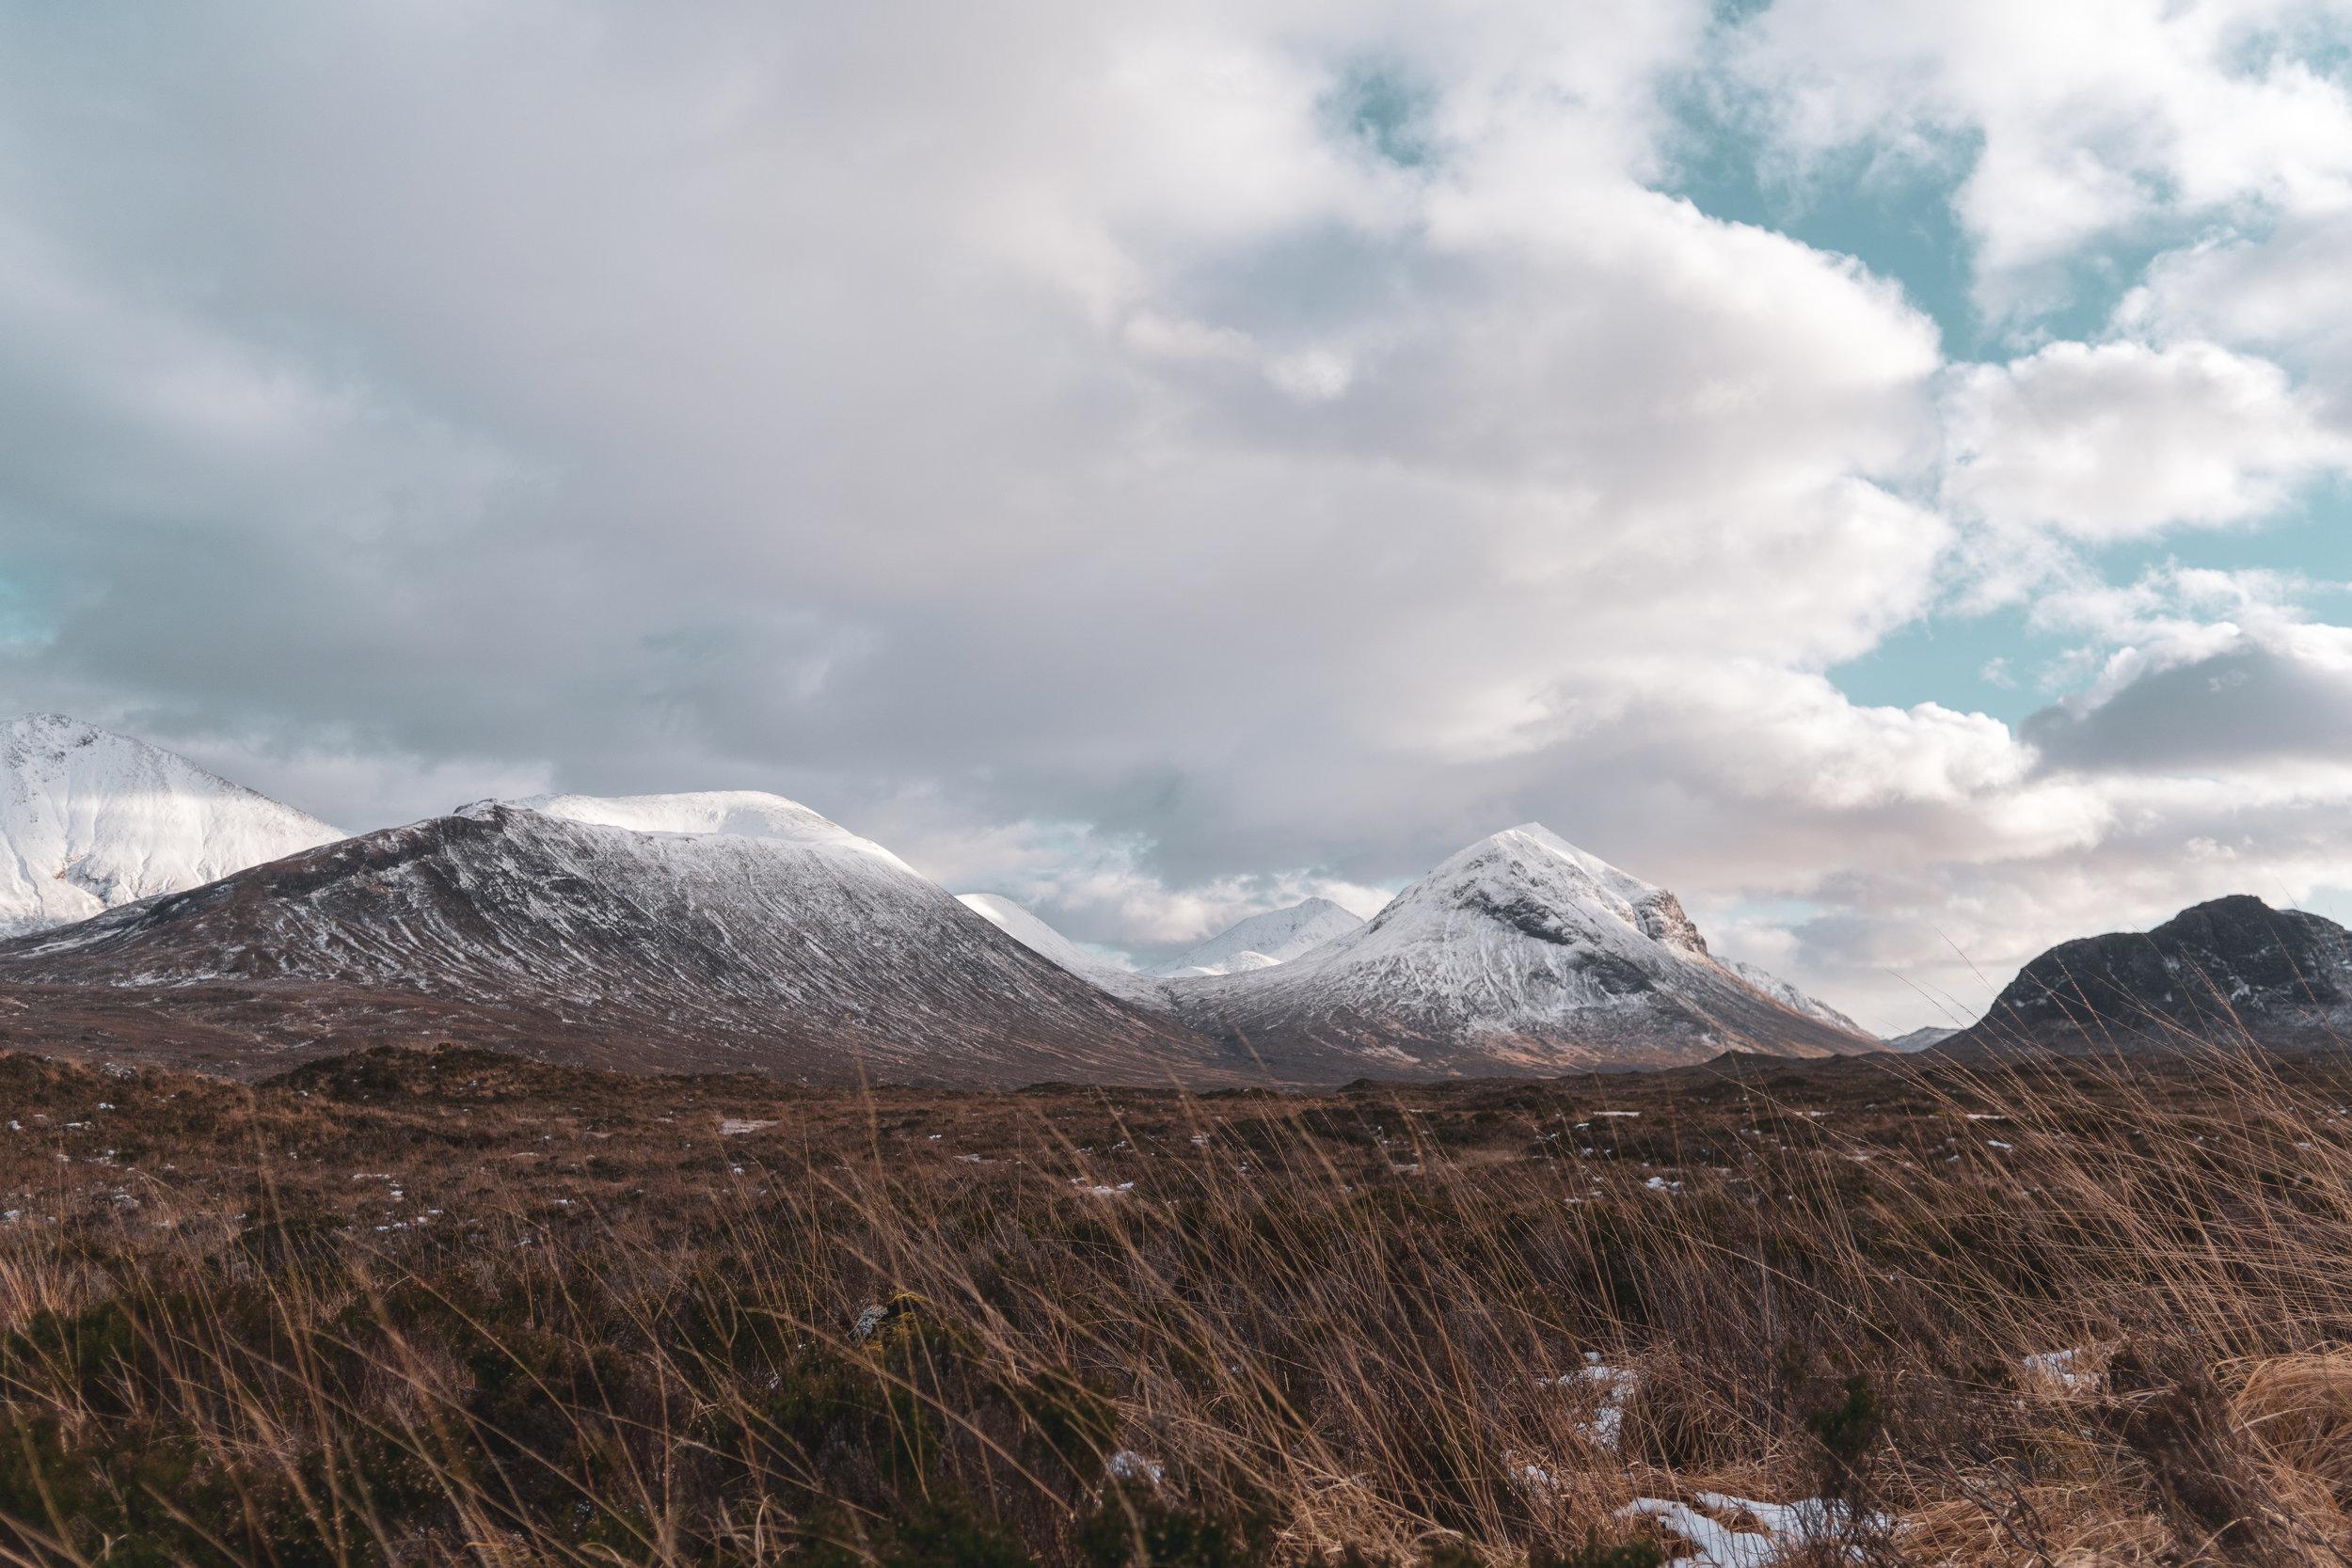 Isle-of-Skye-Fairy-Glen-und-Braes (33).jpg